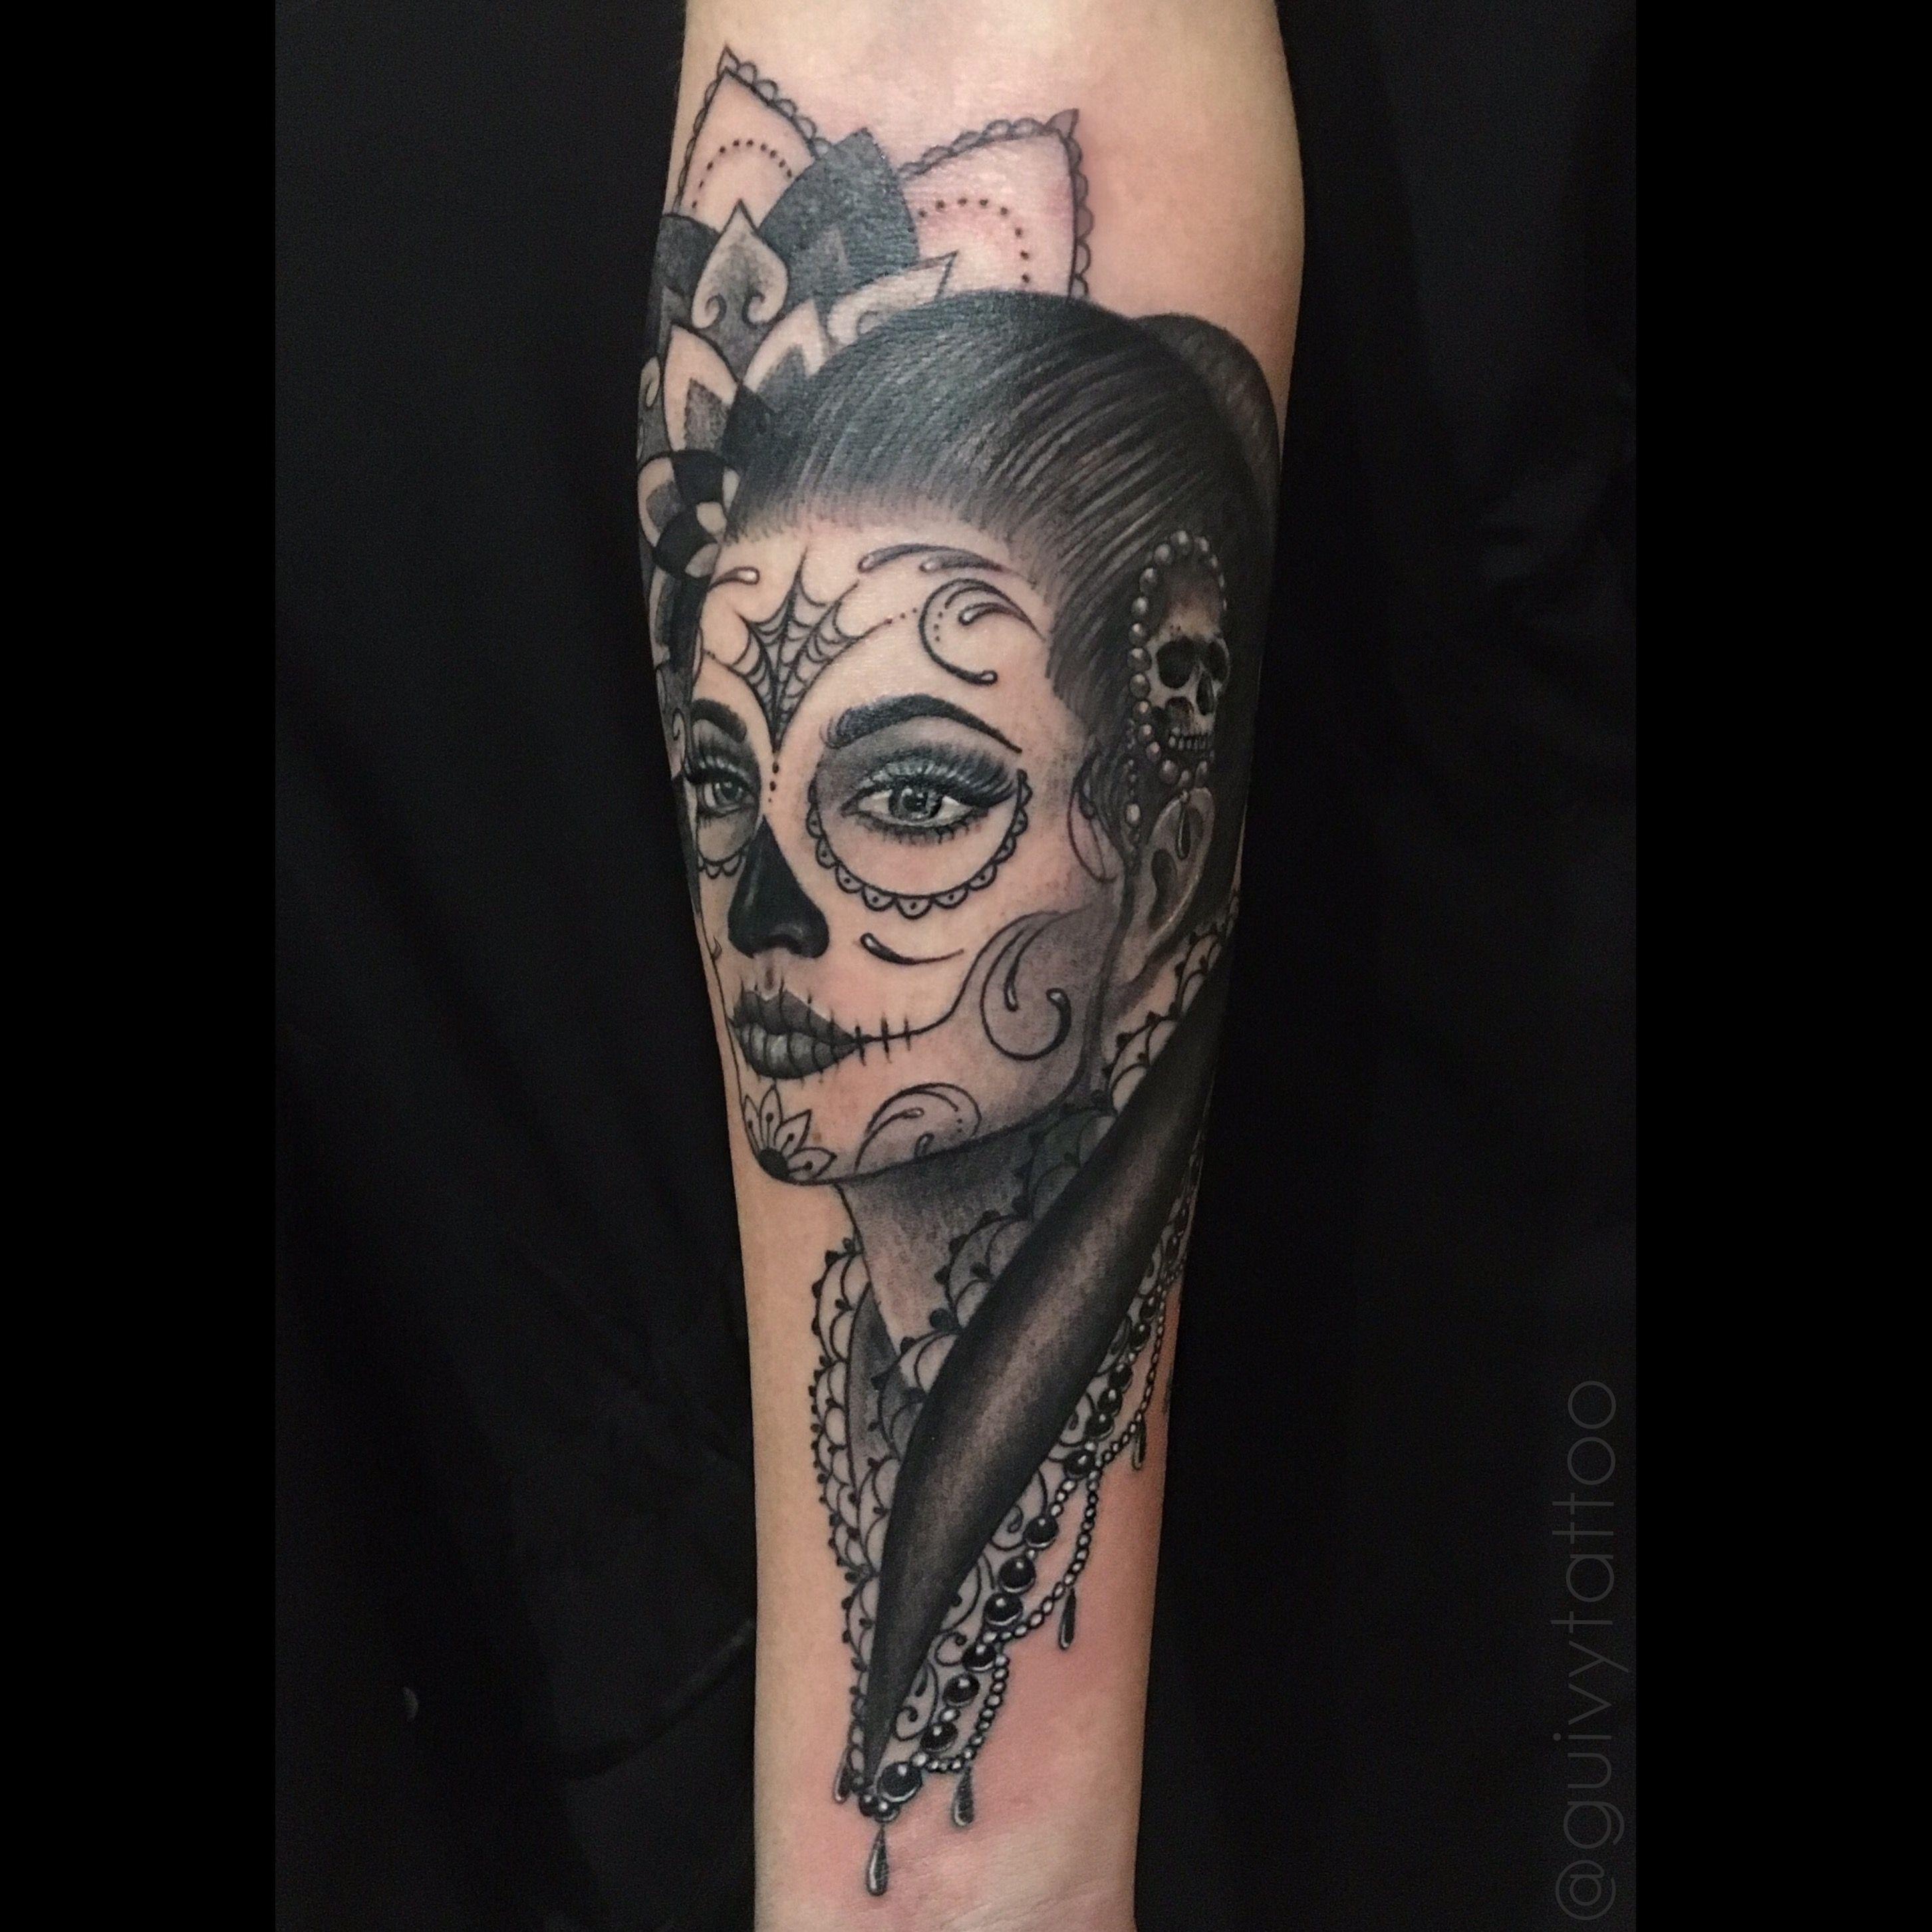 1812f3a2cb483 #guivy #art for sinners #tattoo #geneva #geneve #switzerland #catrina  #portrait #realism #dayofthedead #santamuerte #girly #hairstyle #red  #feminin #mandala ...